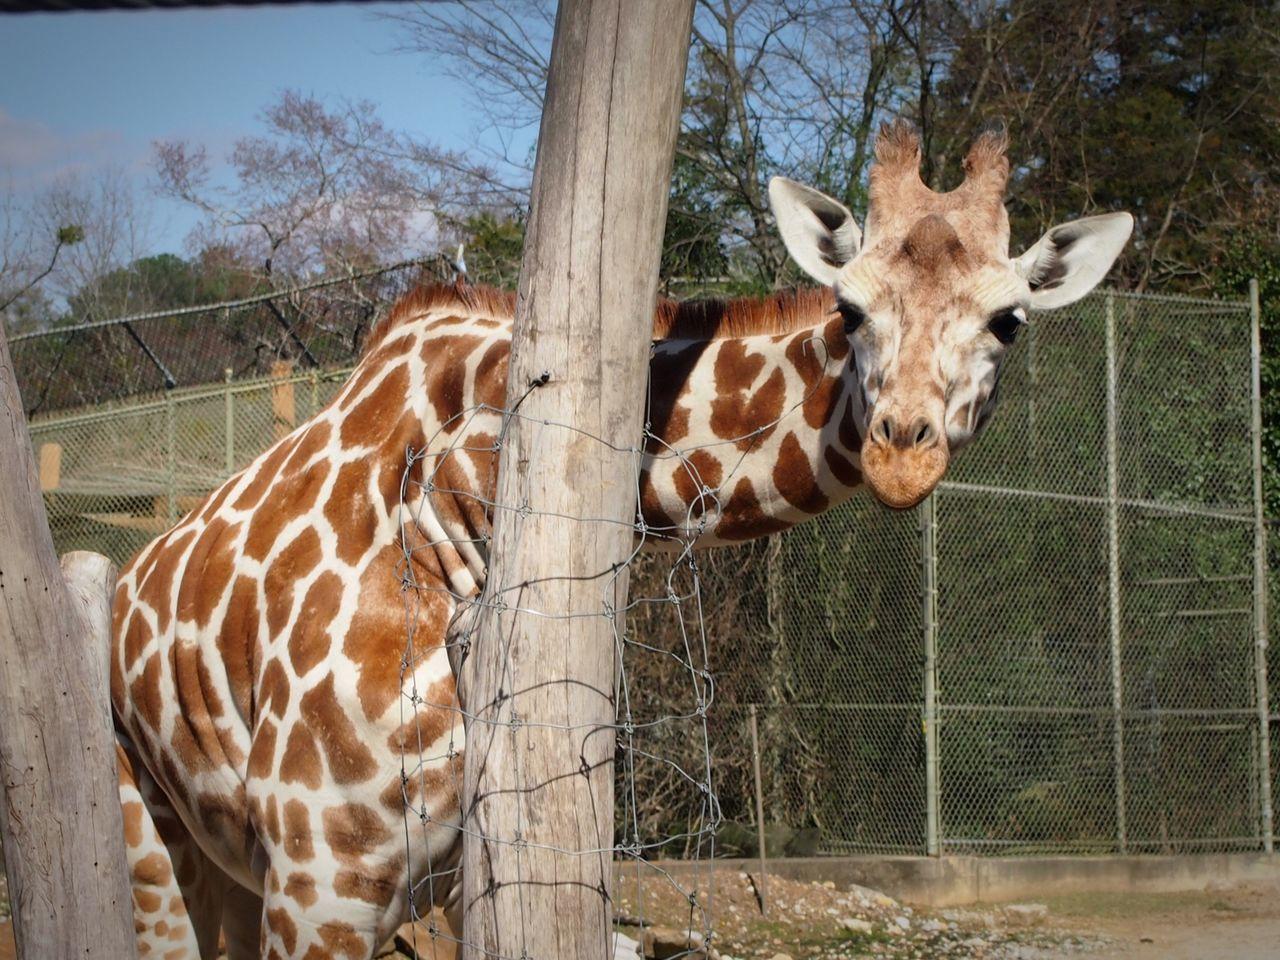 Beautiful stock photos of lustige giraffe, animal themes, fence, tree, one animal